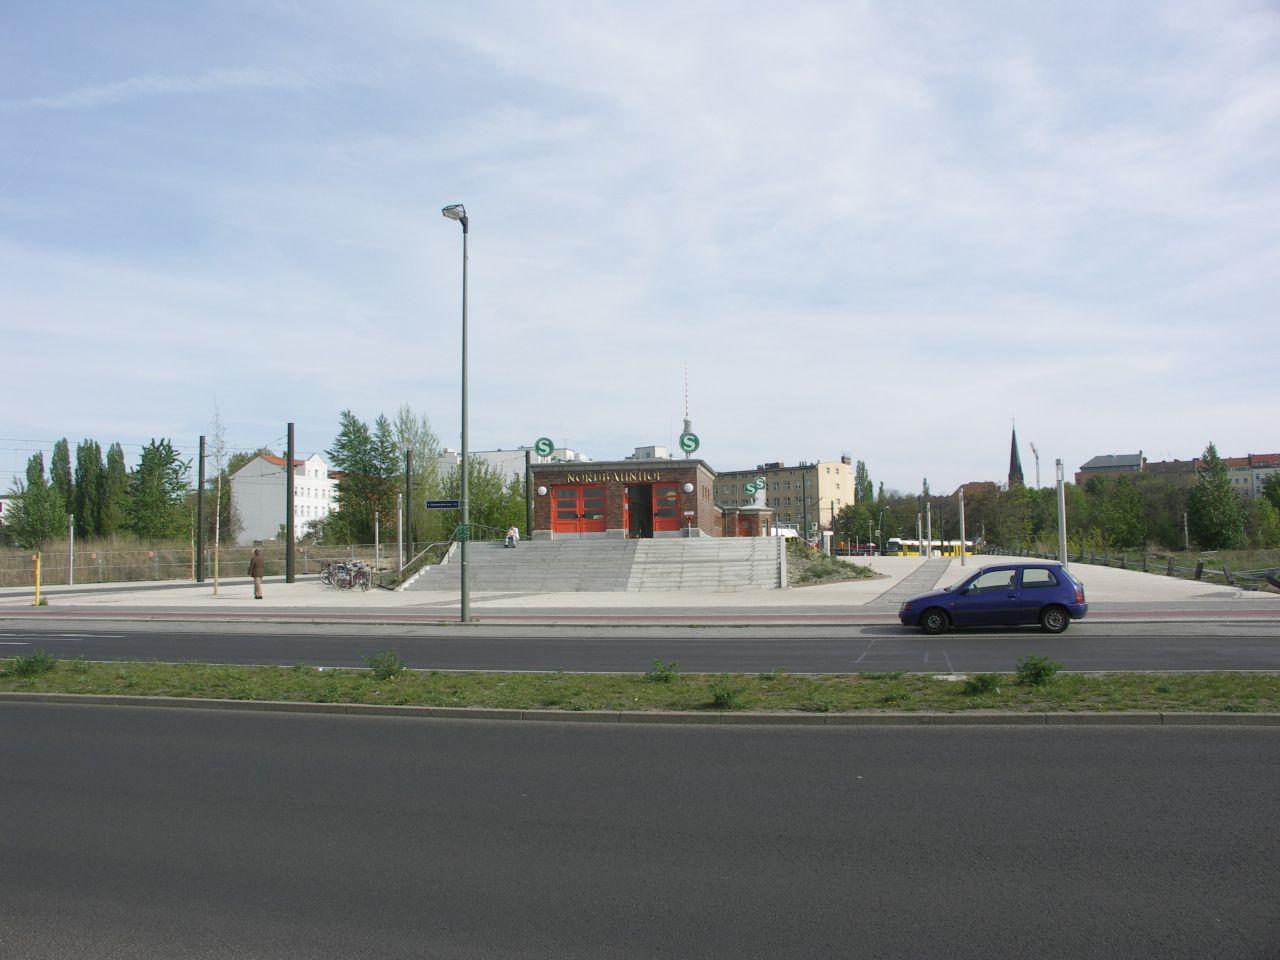 126_s_nordbahnhof.jpg